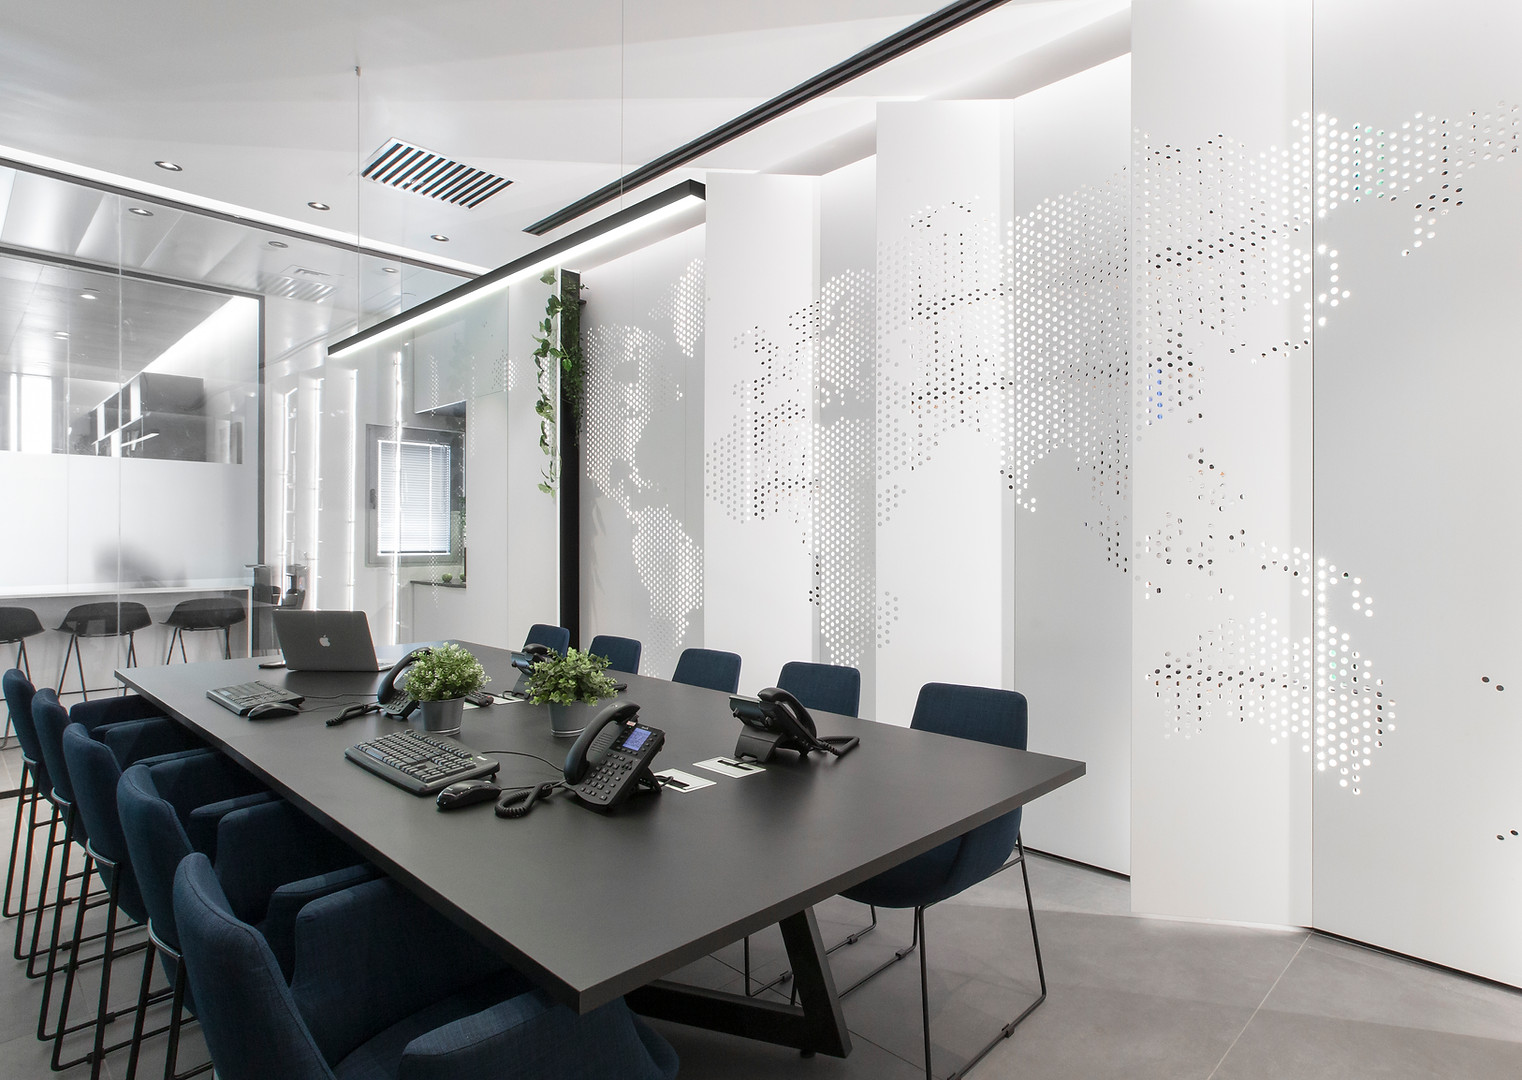 Holon tours office | משרדי חולון טורס